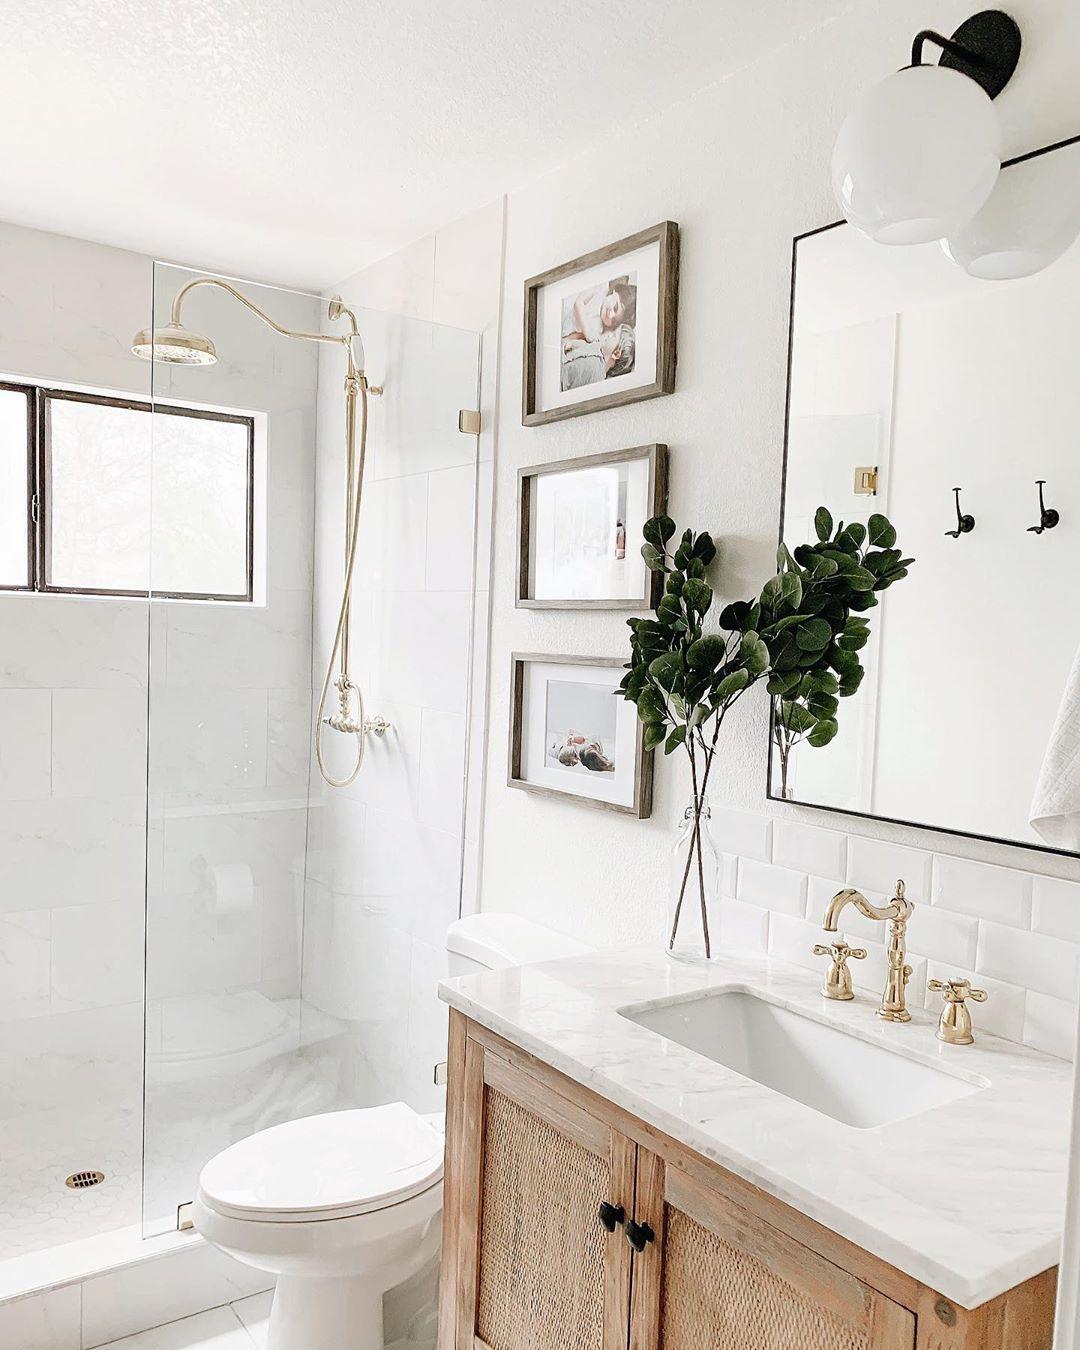 Kb1972ax 8 In Widespread Bathroom Faucet Polished Brass Oak